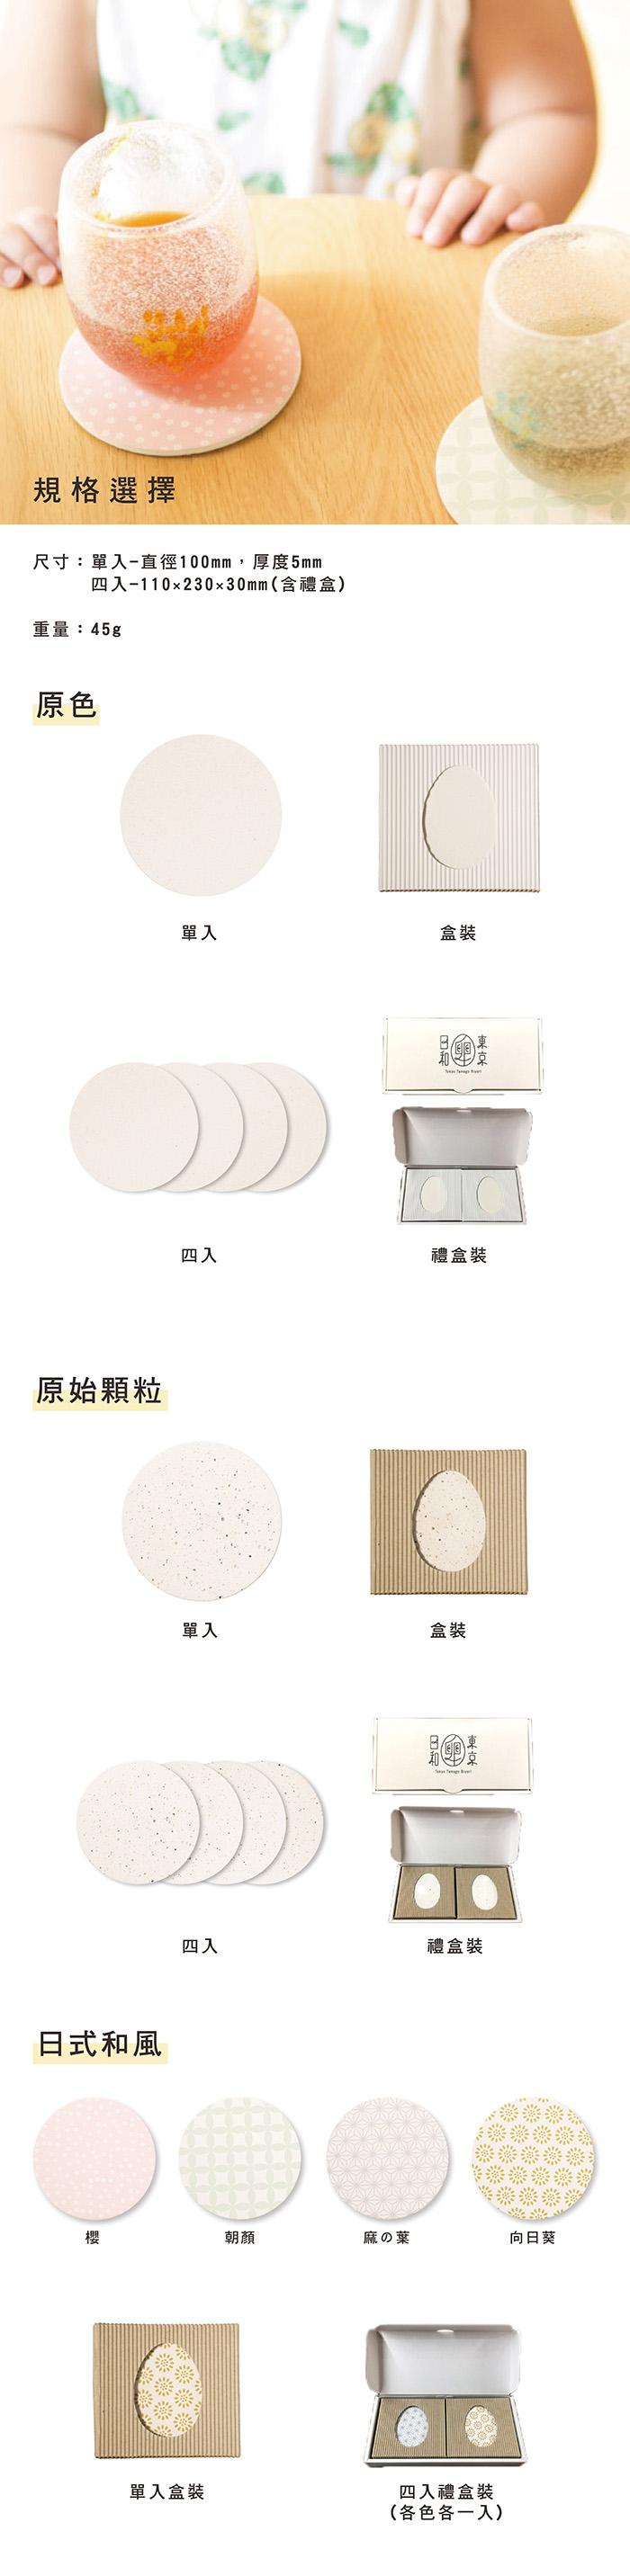 UFUFU 強力吸水蛋殼防滑杯墊(單入)